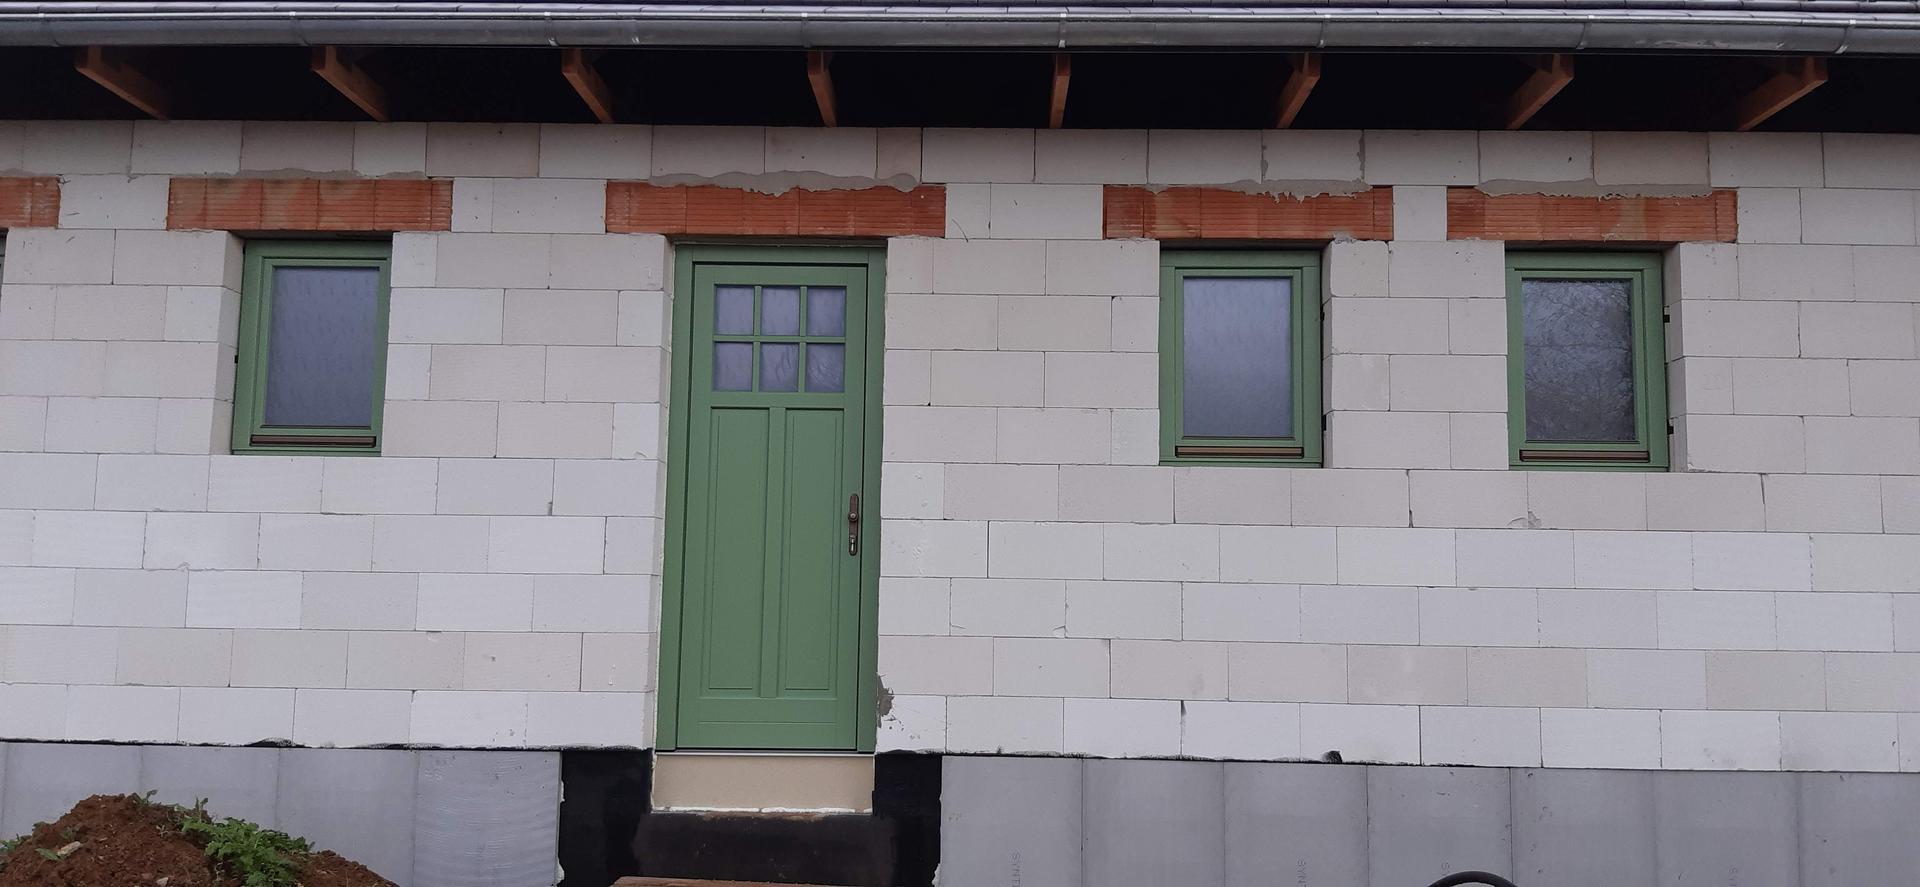 Okna a dveře - Obrázek č. 3